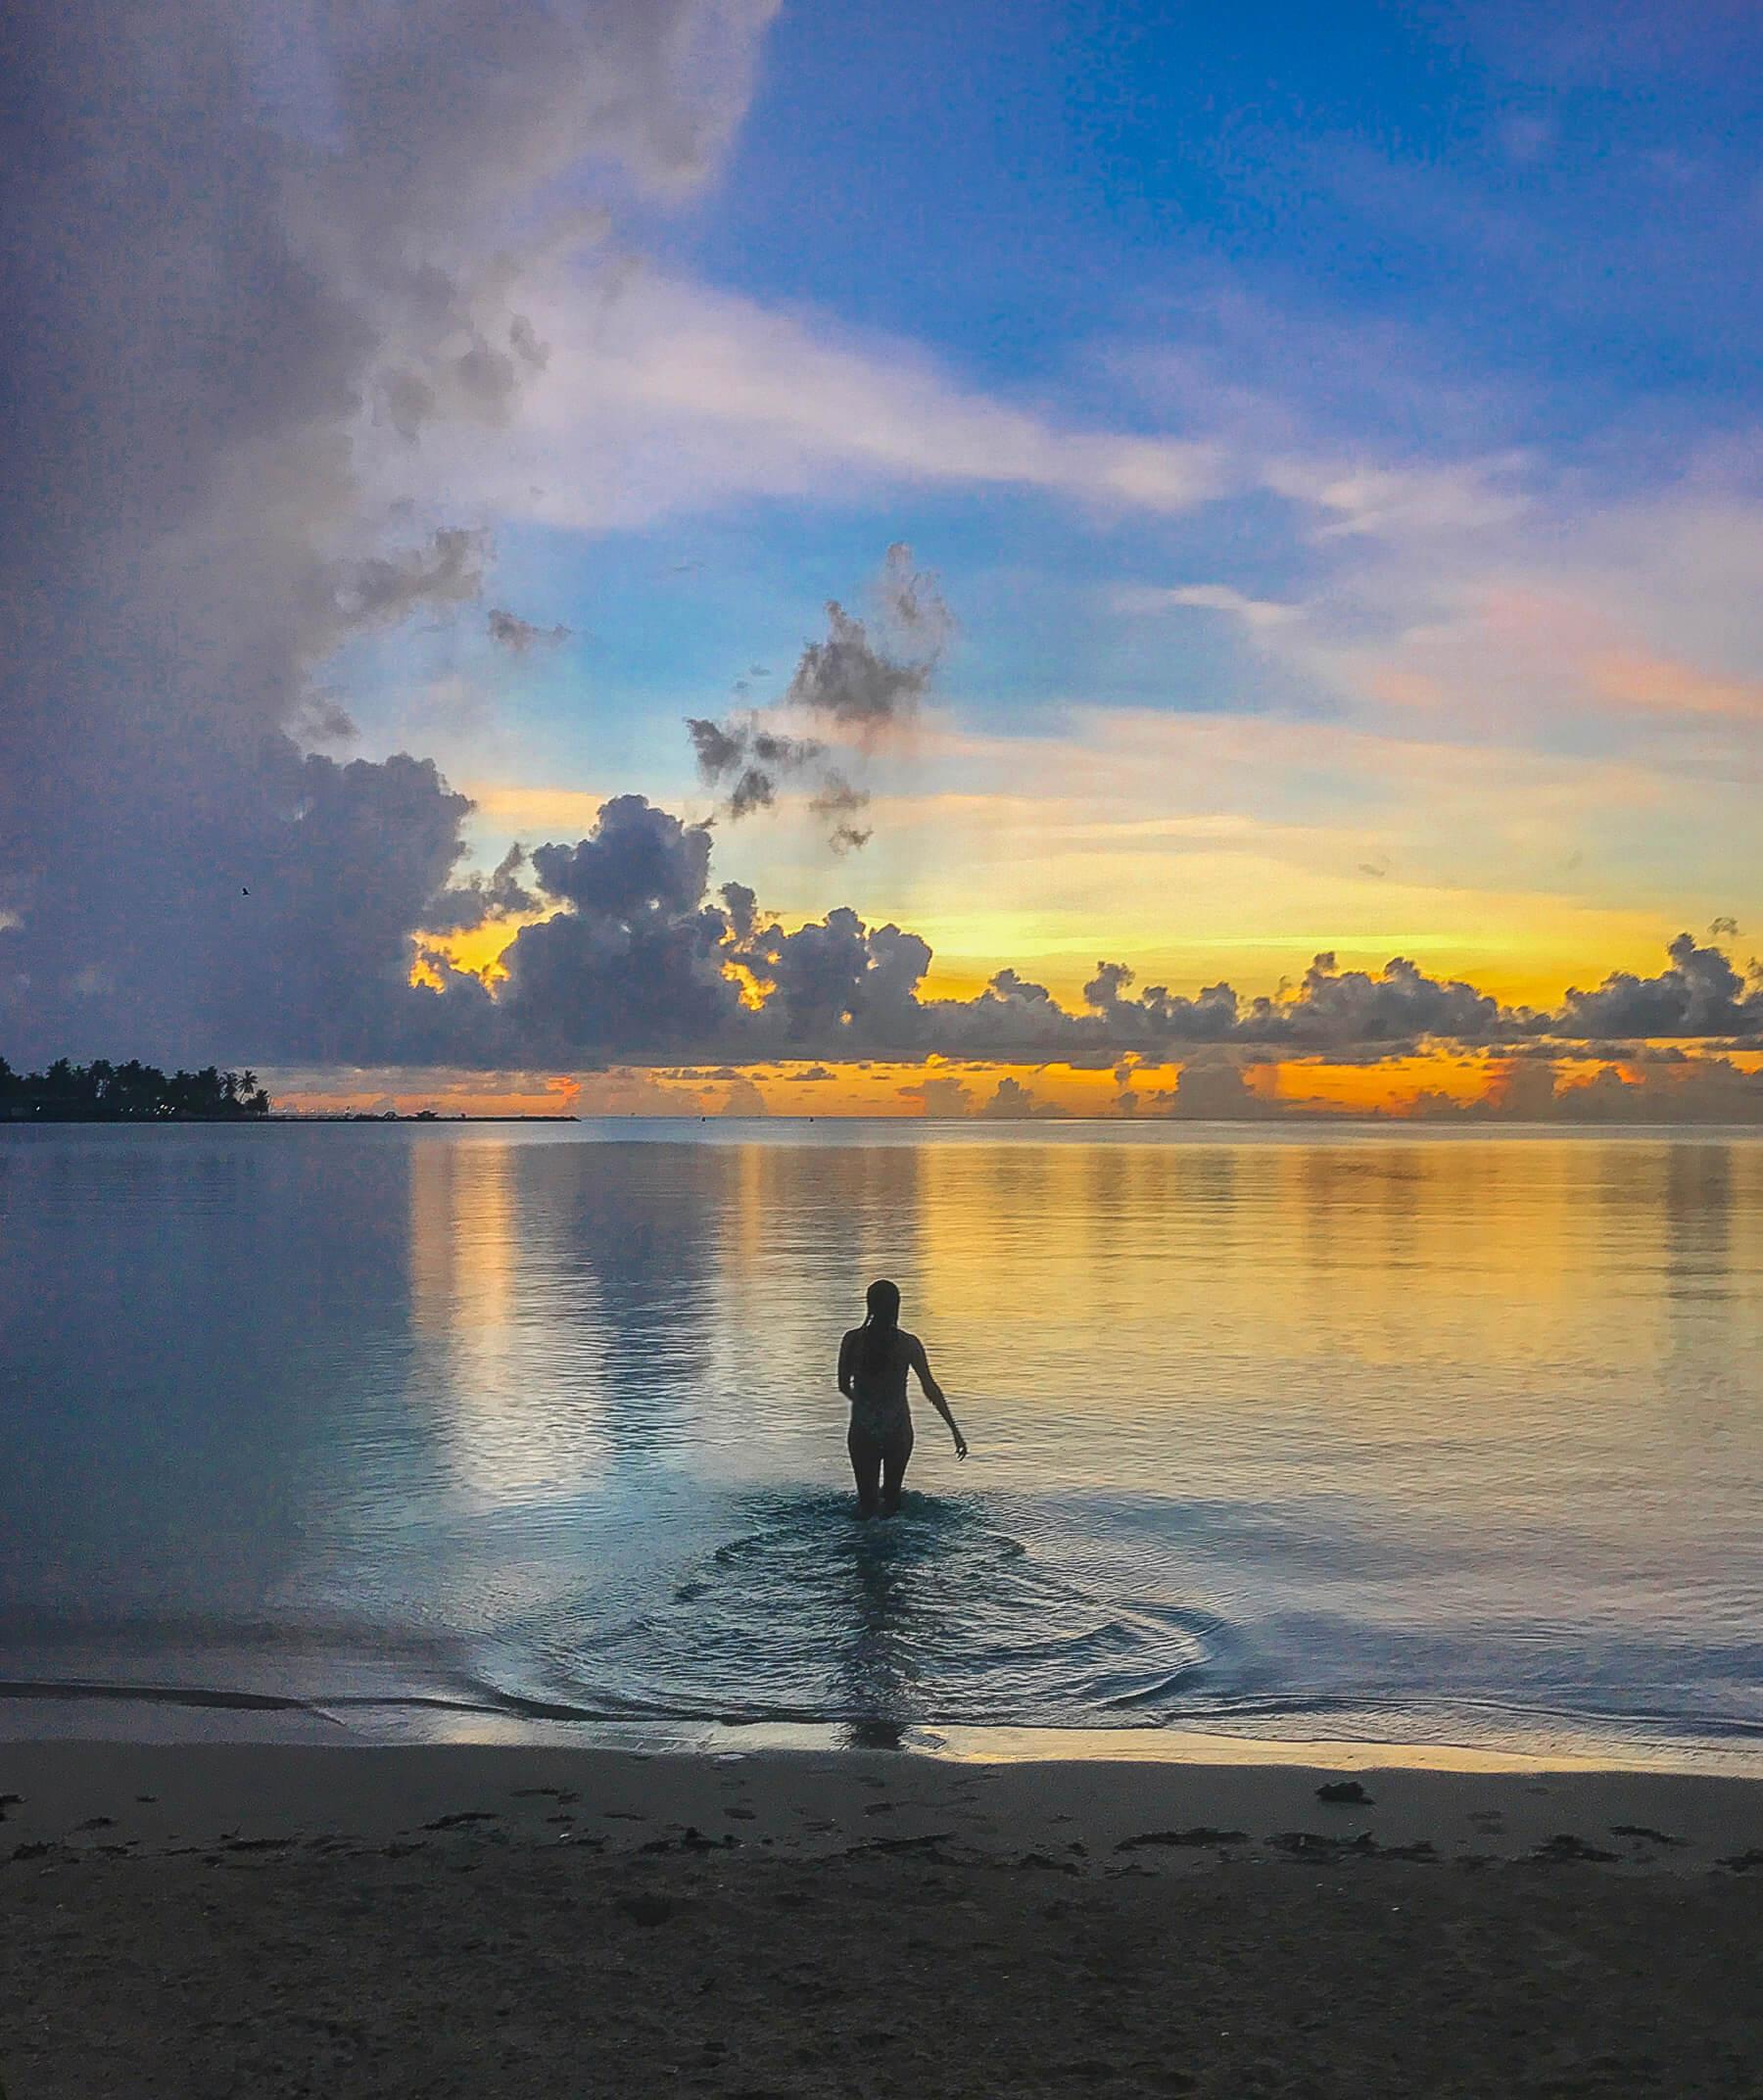 Silhouette of girl walking in ocean towards sunset